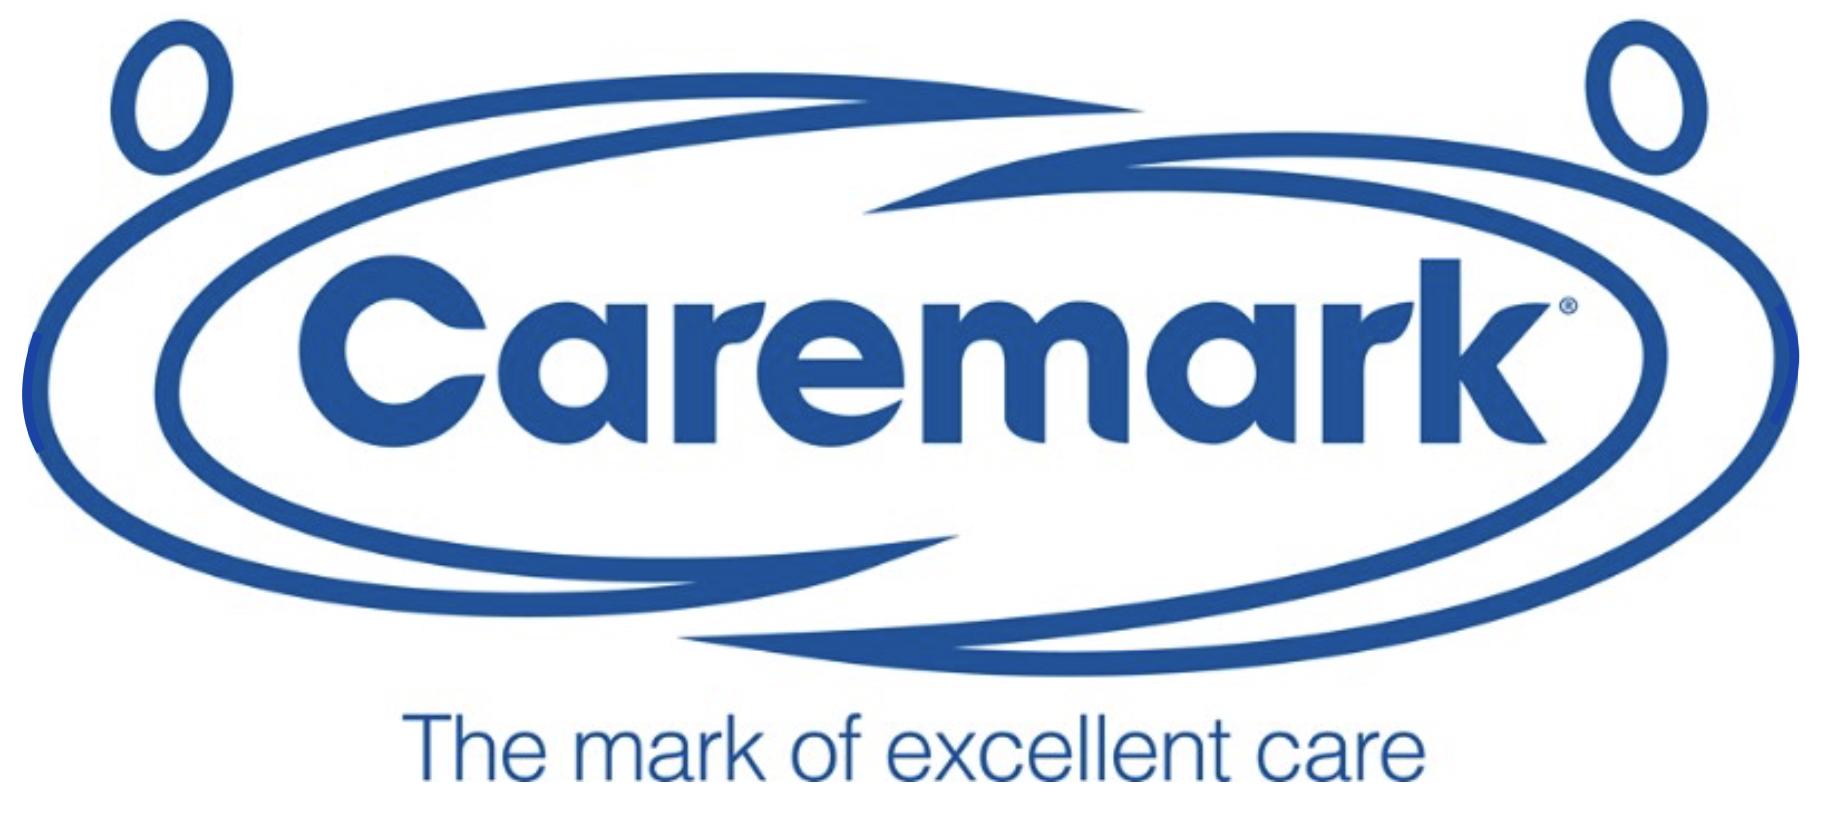 Caremark2